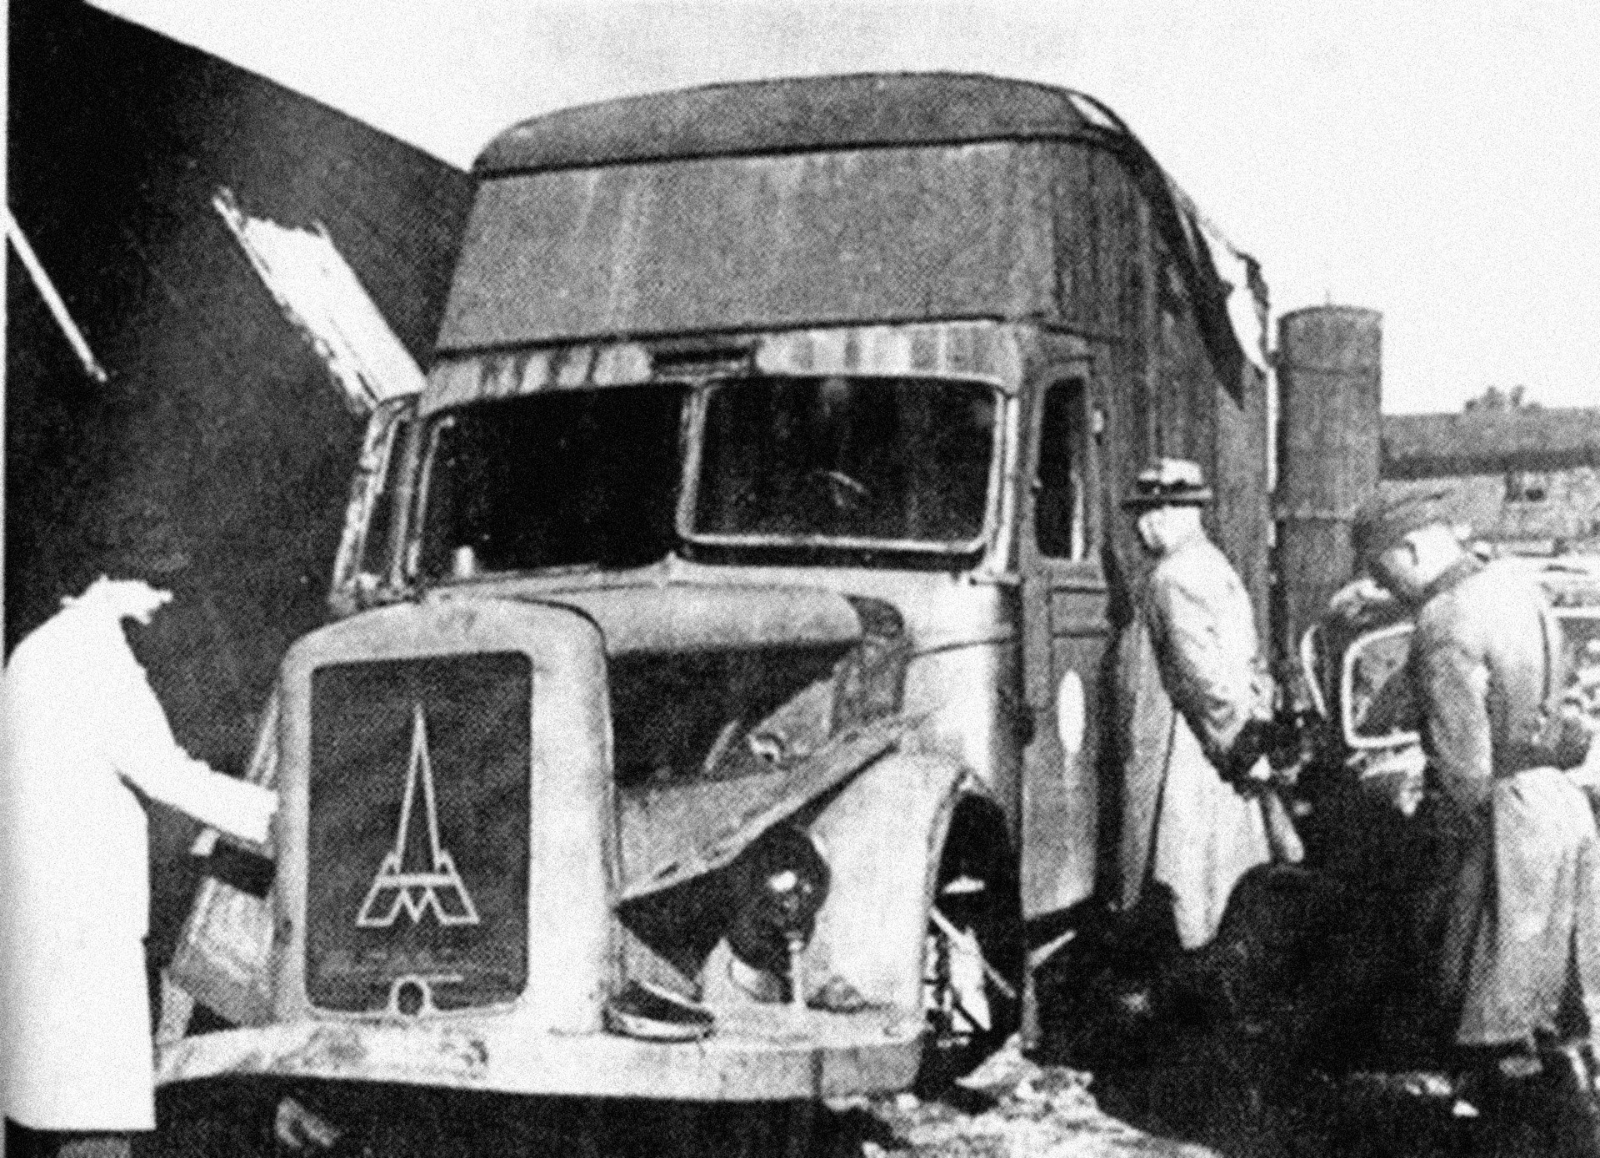 File:Destroyed Magirus-Deutz furniture transport van Kolno Poland 1945.jpg